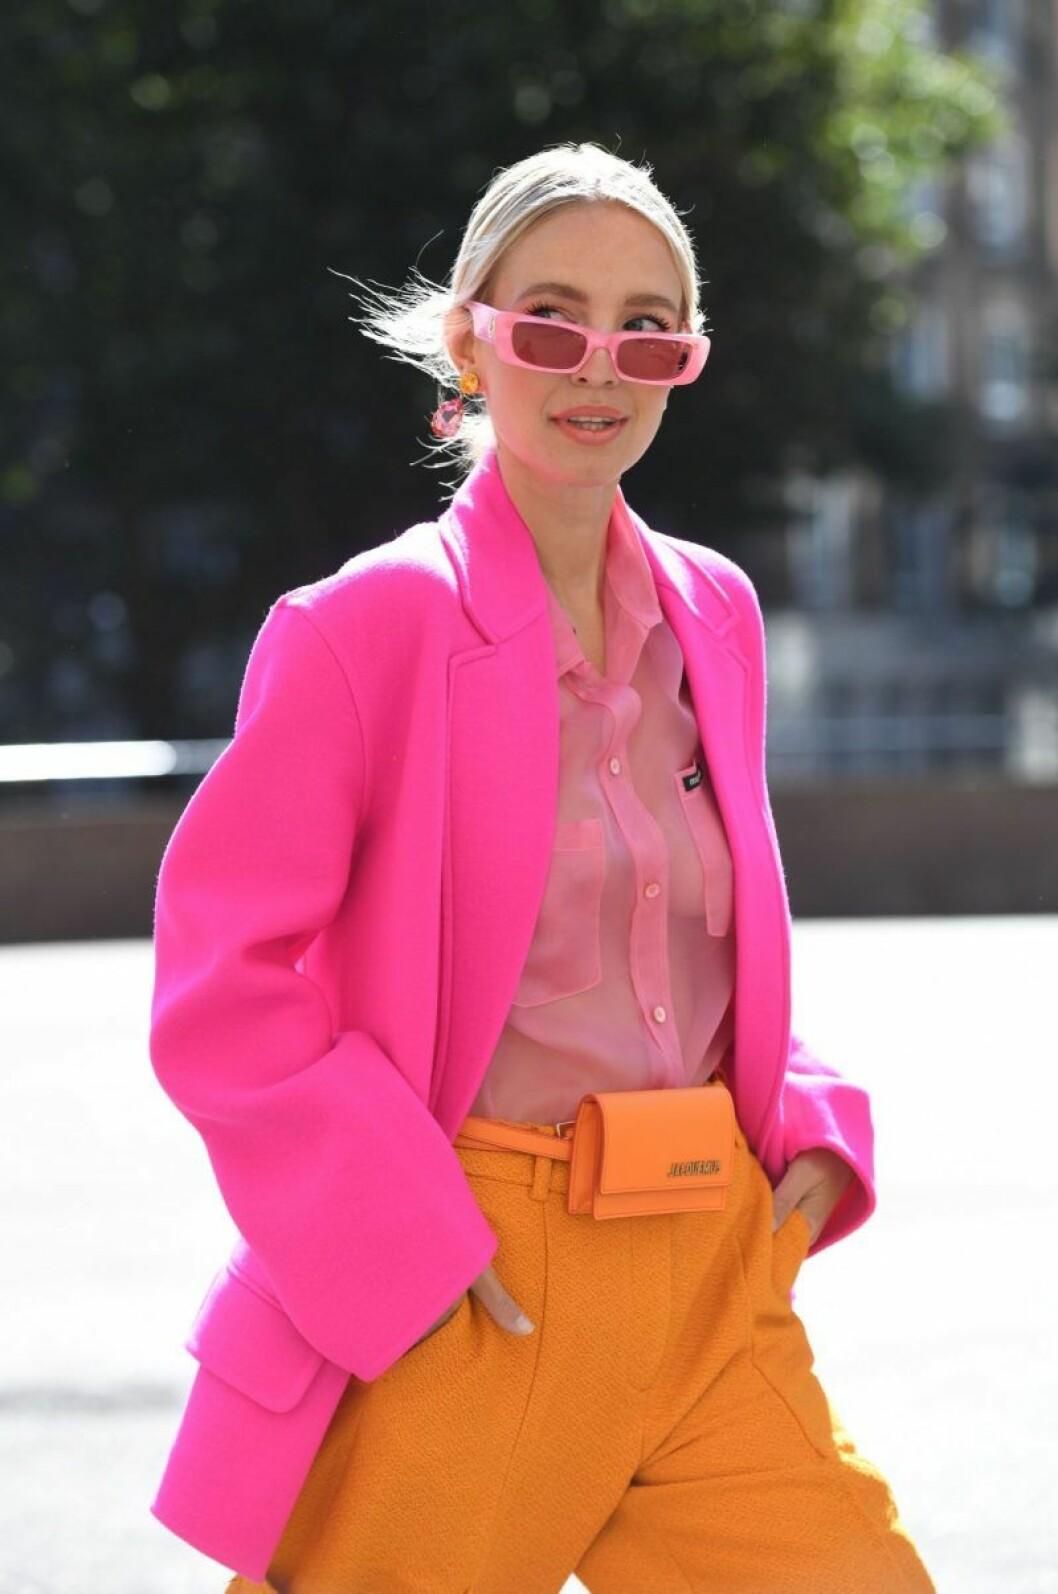 Leonie Hanne i rosa kavaj och rosa solglasögon